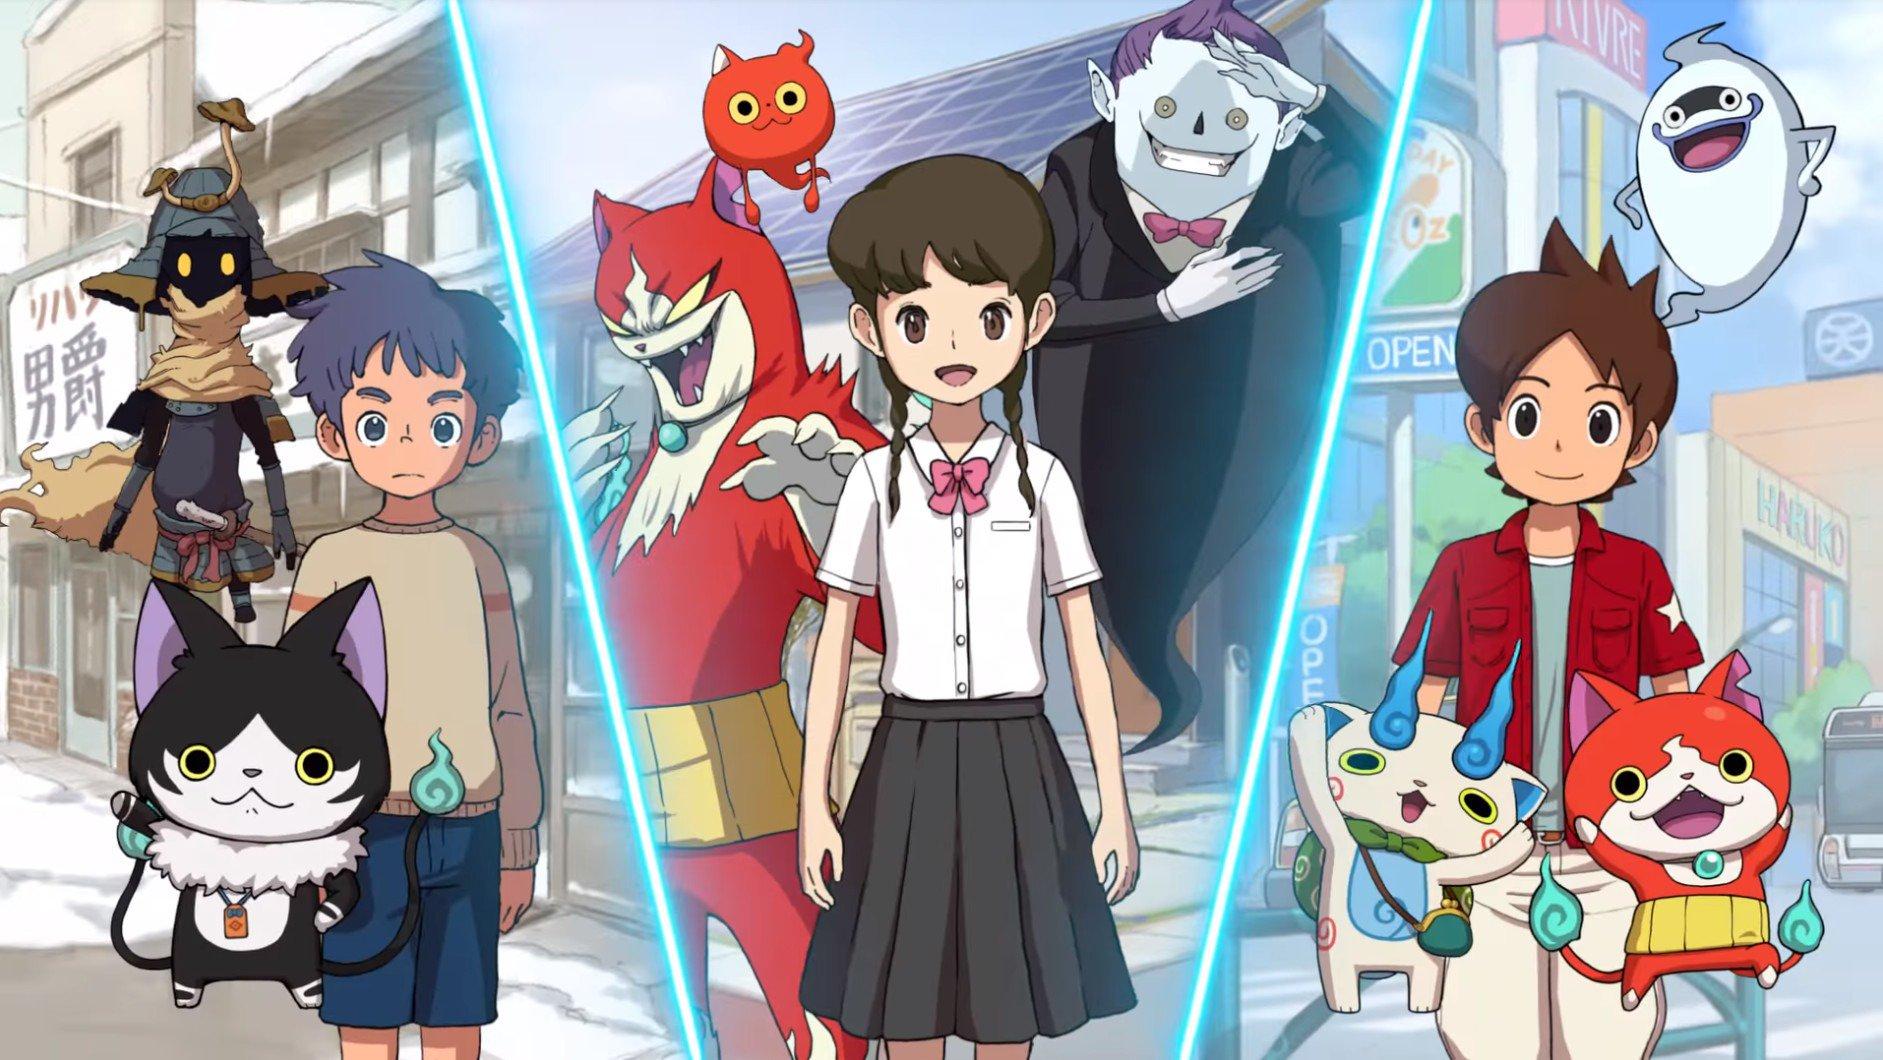 Confira as notas de reviews da Famitsu (25/06/19)